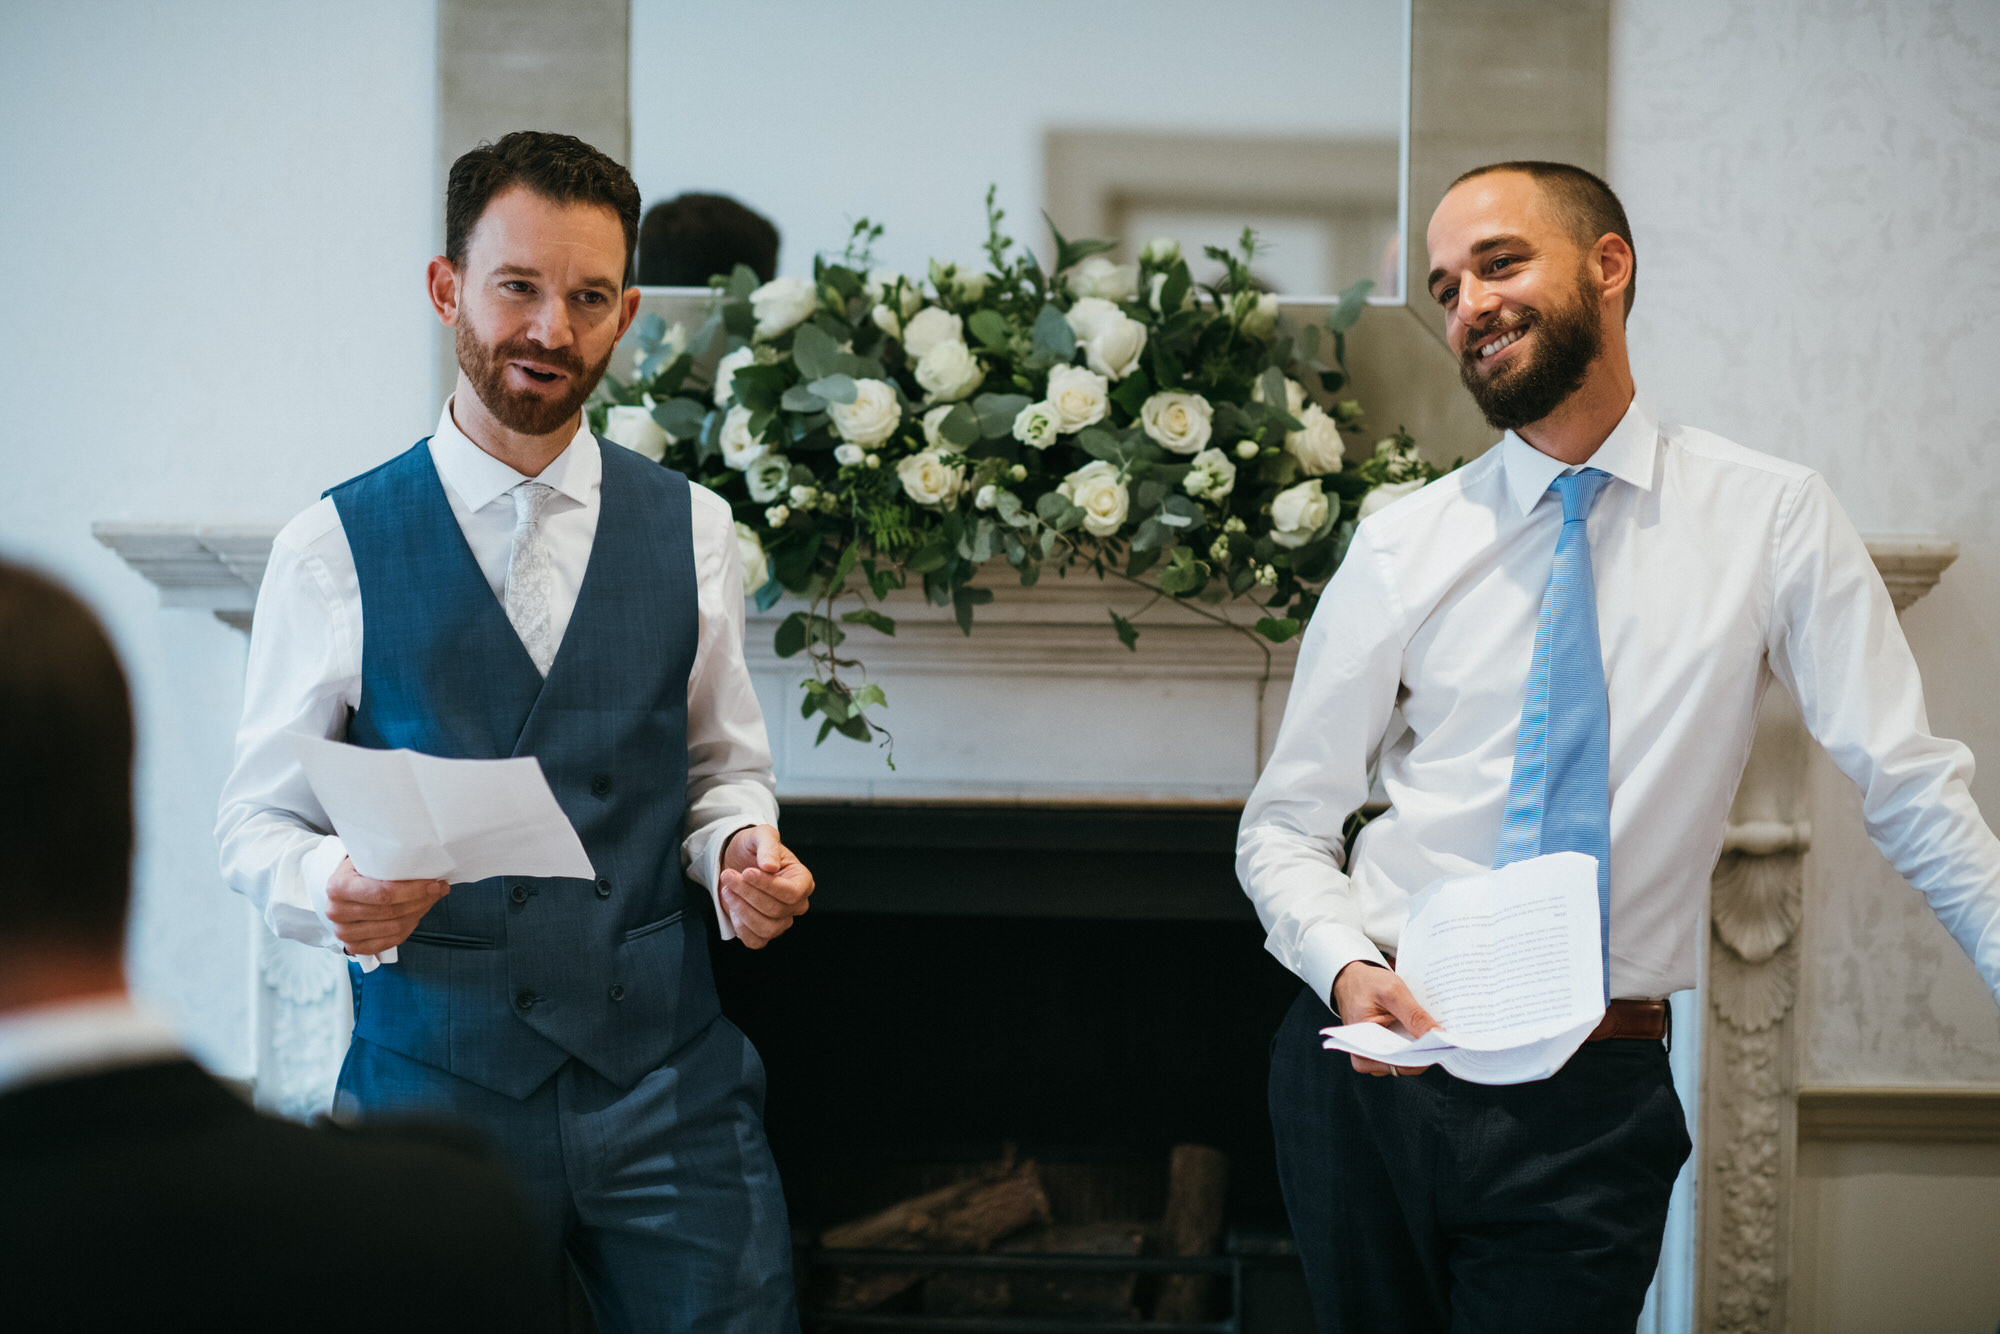 Royal crescent wedding speechs